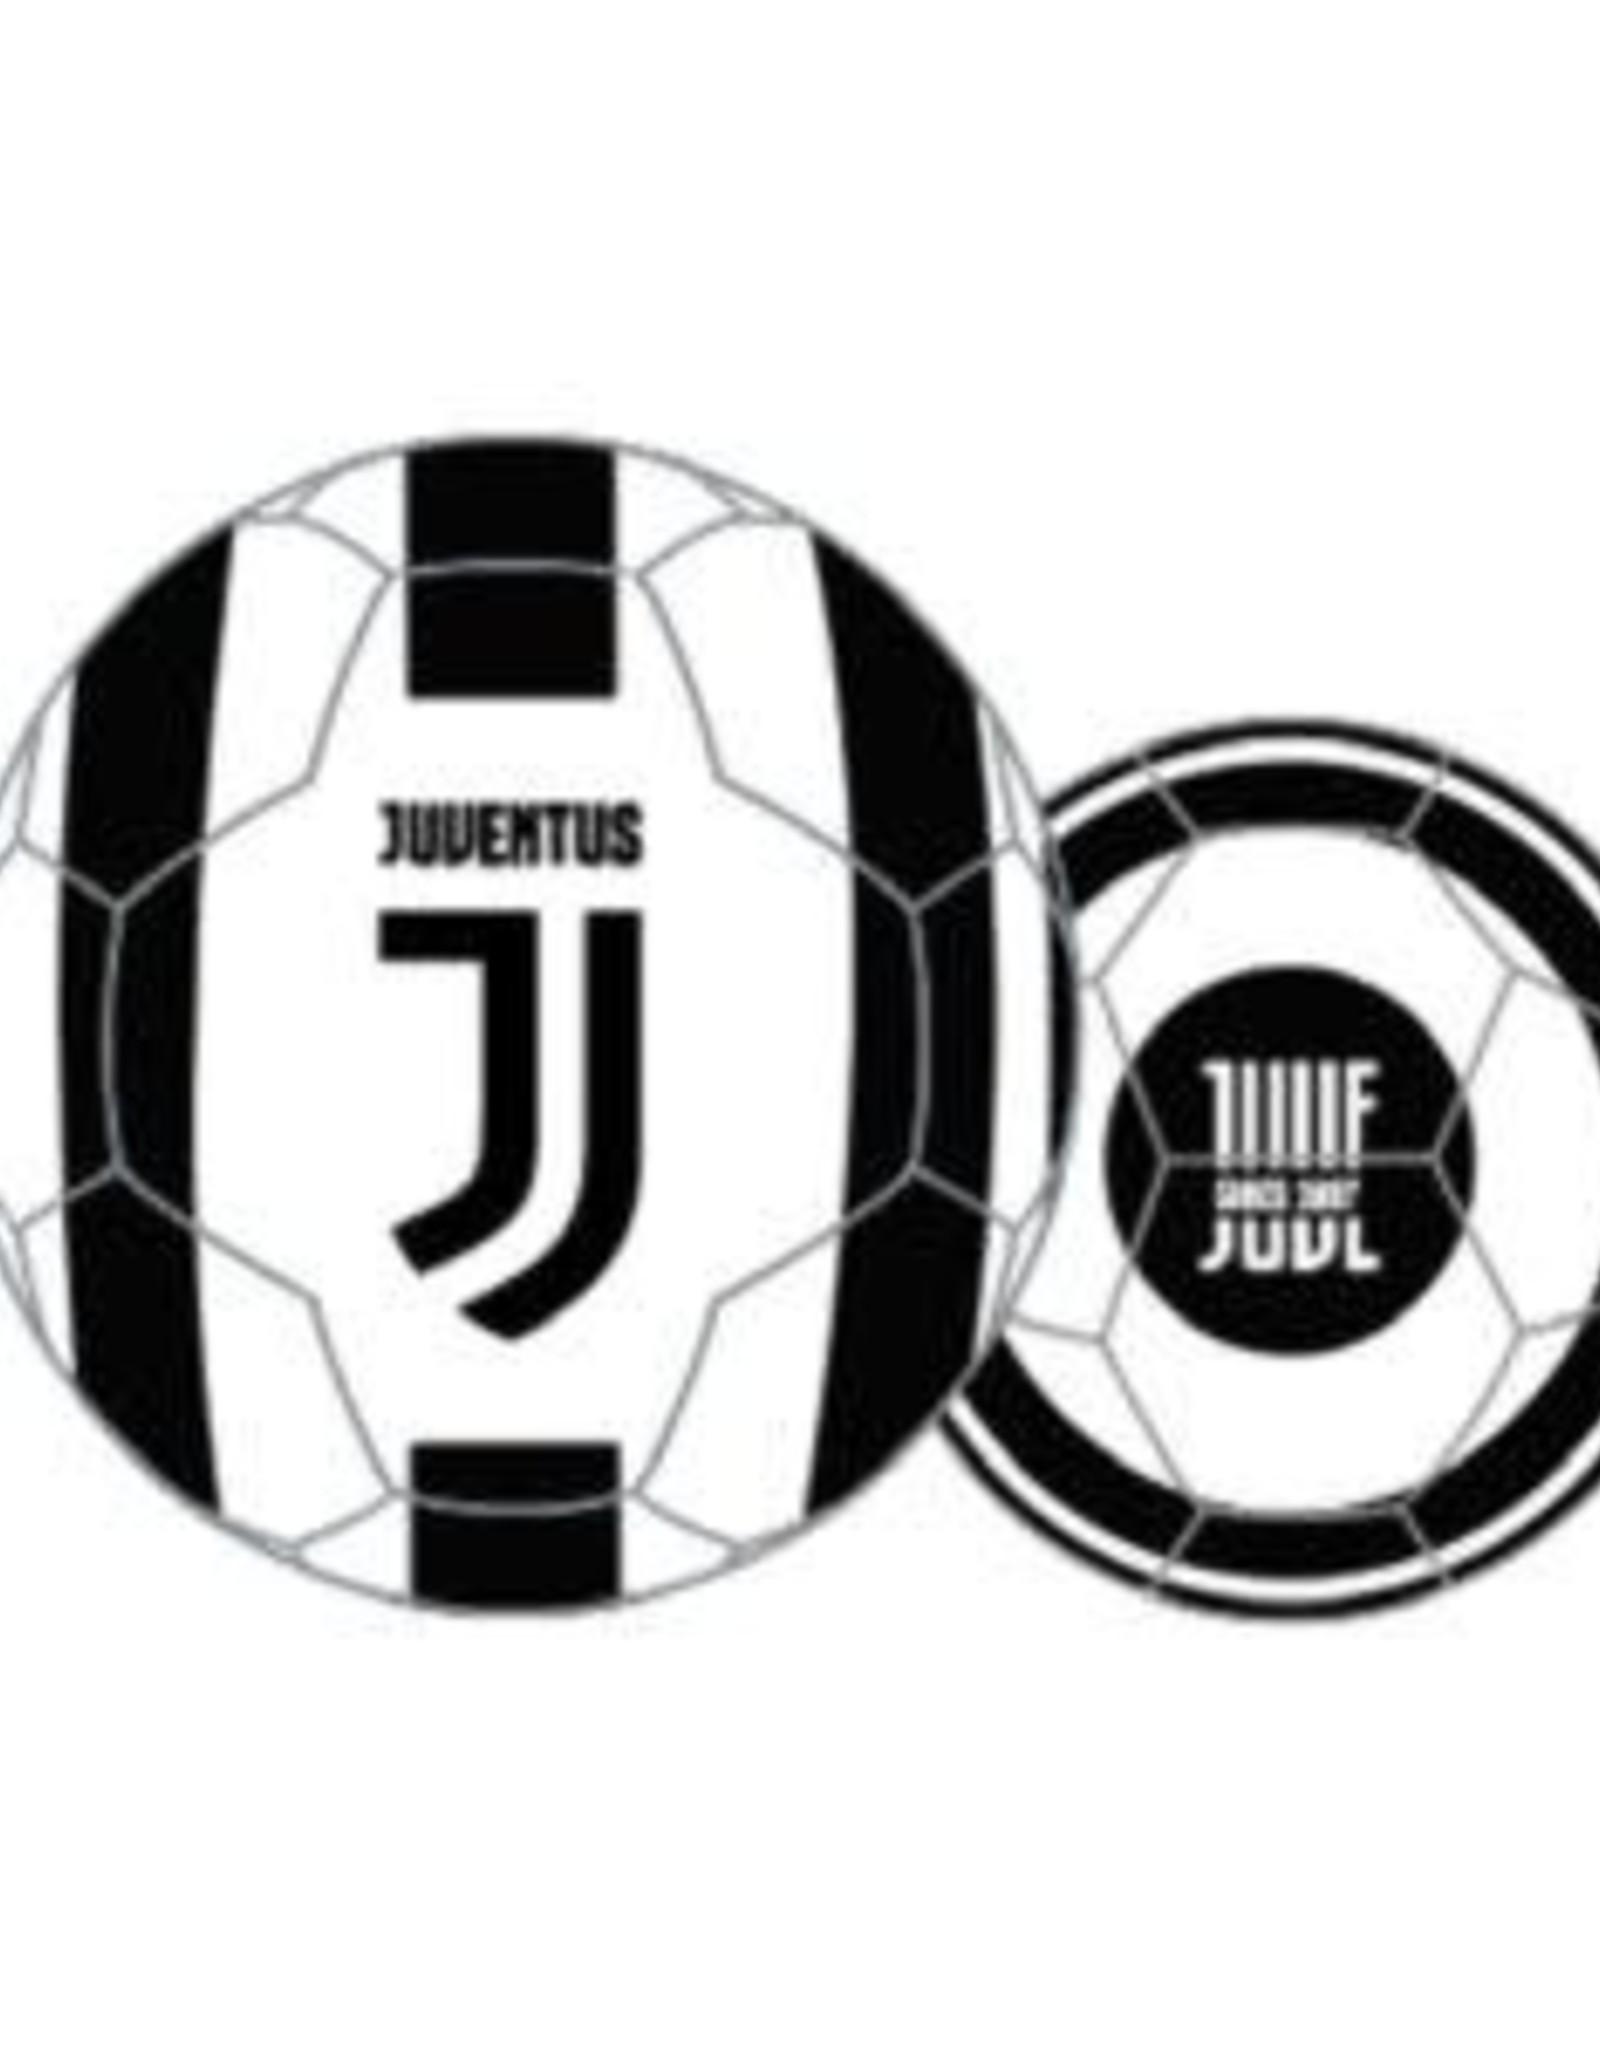 Juvenus Since 1897 Soccer Ball Size 5